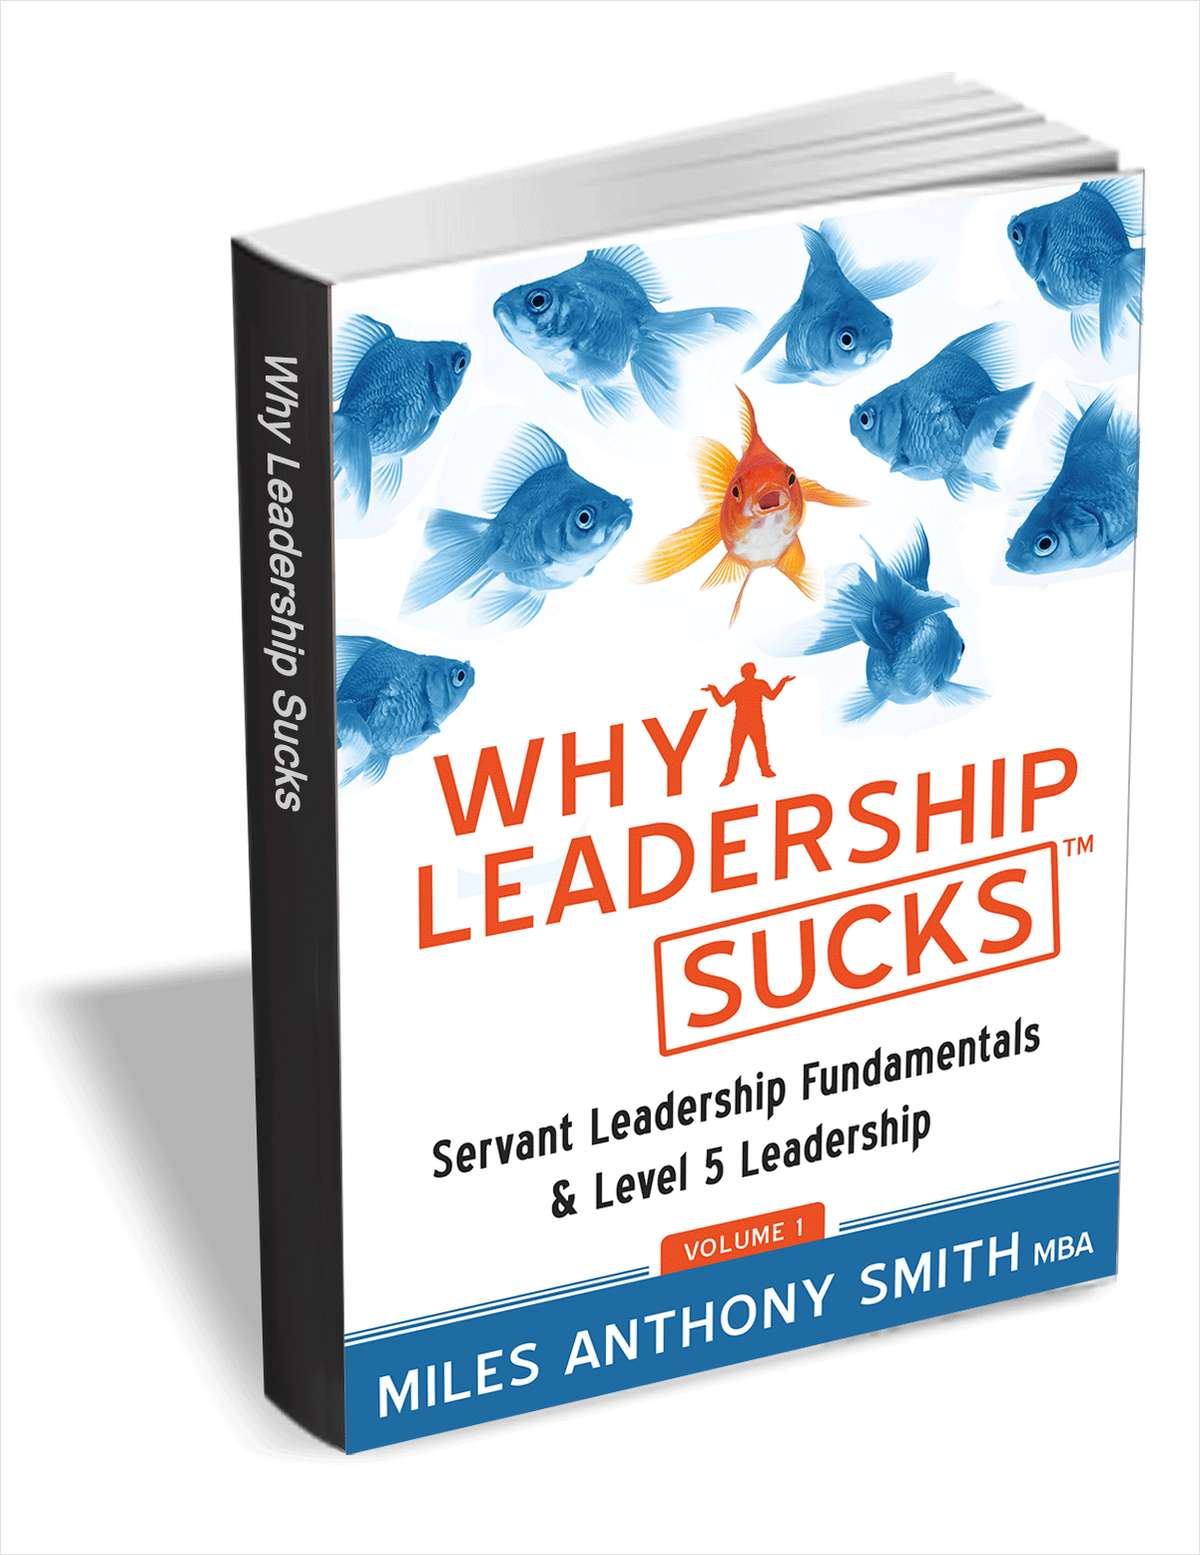 Why Leadership Sucks: The Fundamentals of Level 5 Leadership and Servant Leadership (Free eBook) A $14.95 Value